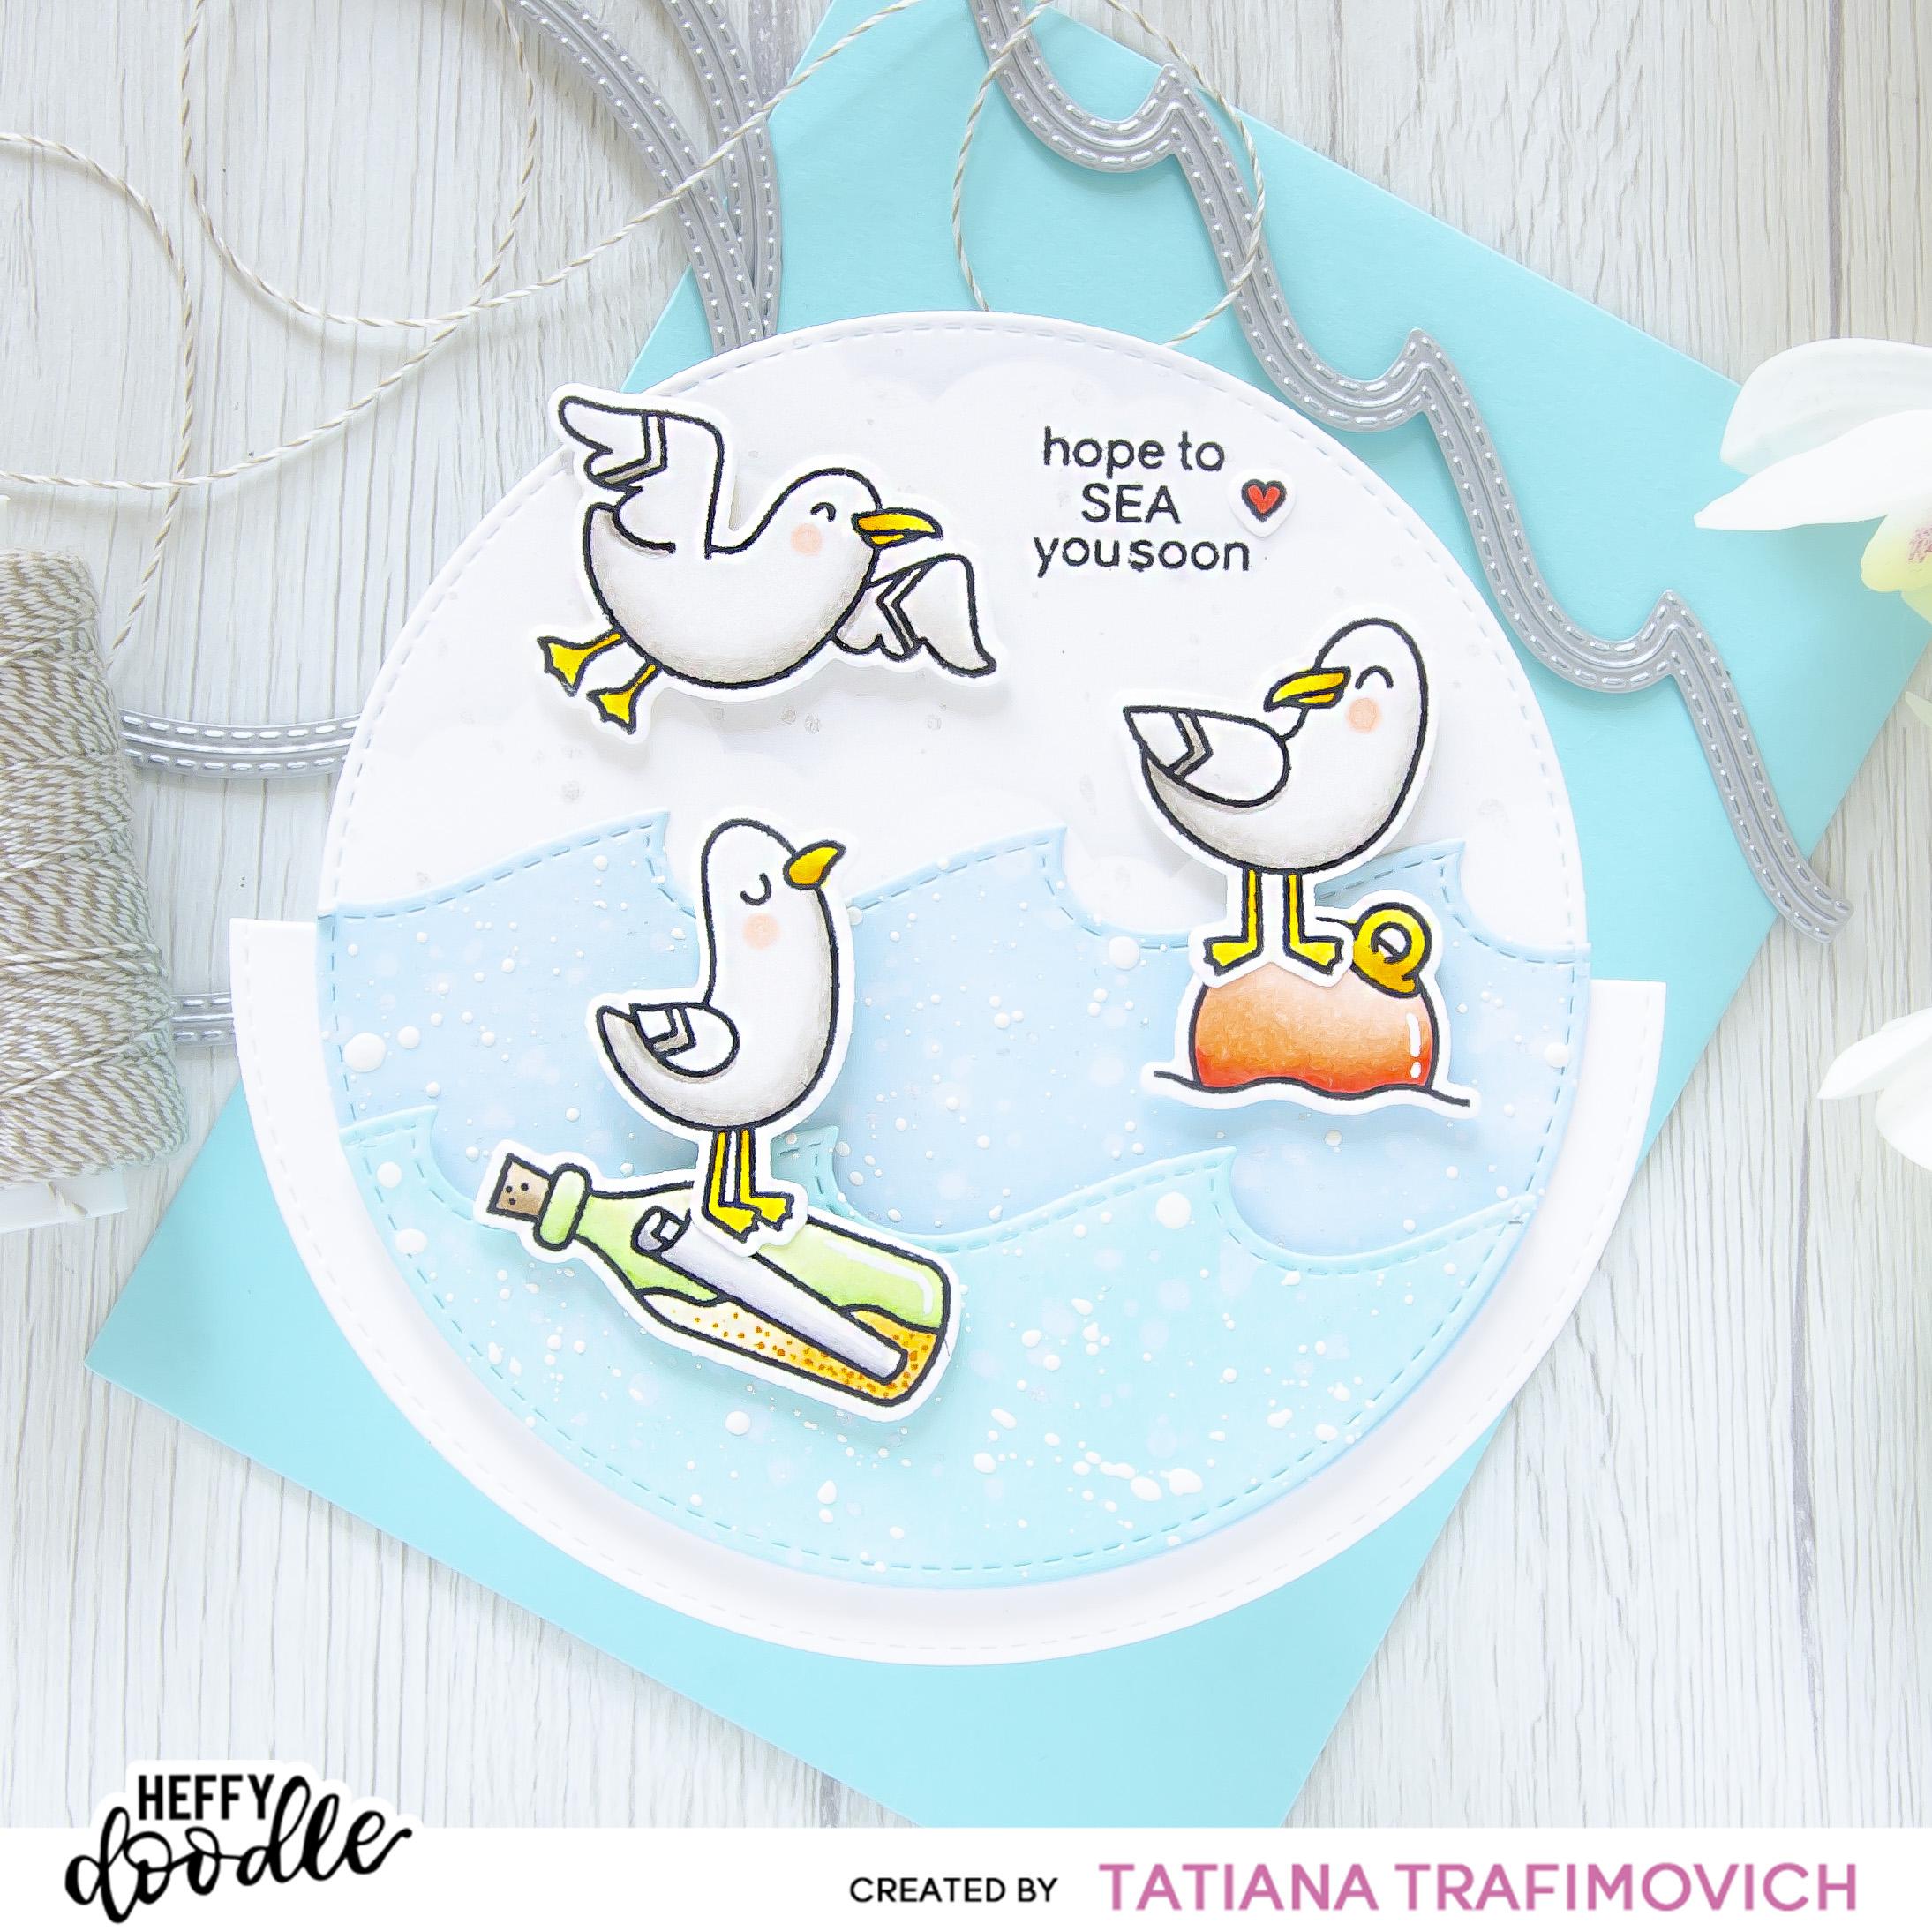 Hope To SEA You Soon #handmade card by Tatiana Trafimovich #tatianacraftandart - You Go, Gull stamp set by Heffy Doodle #heffydoodle